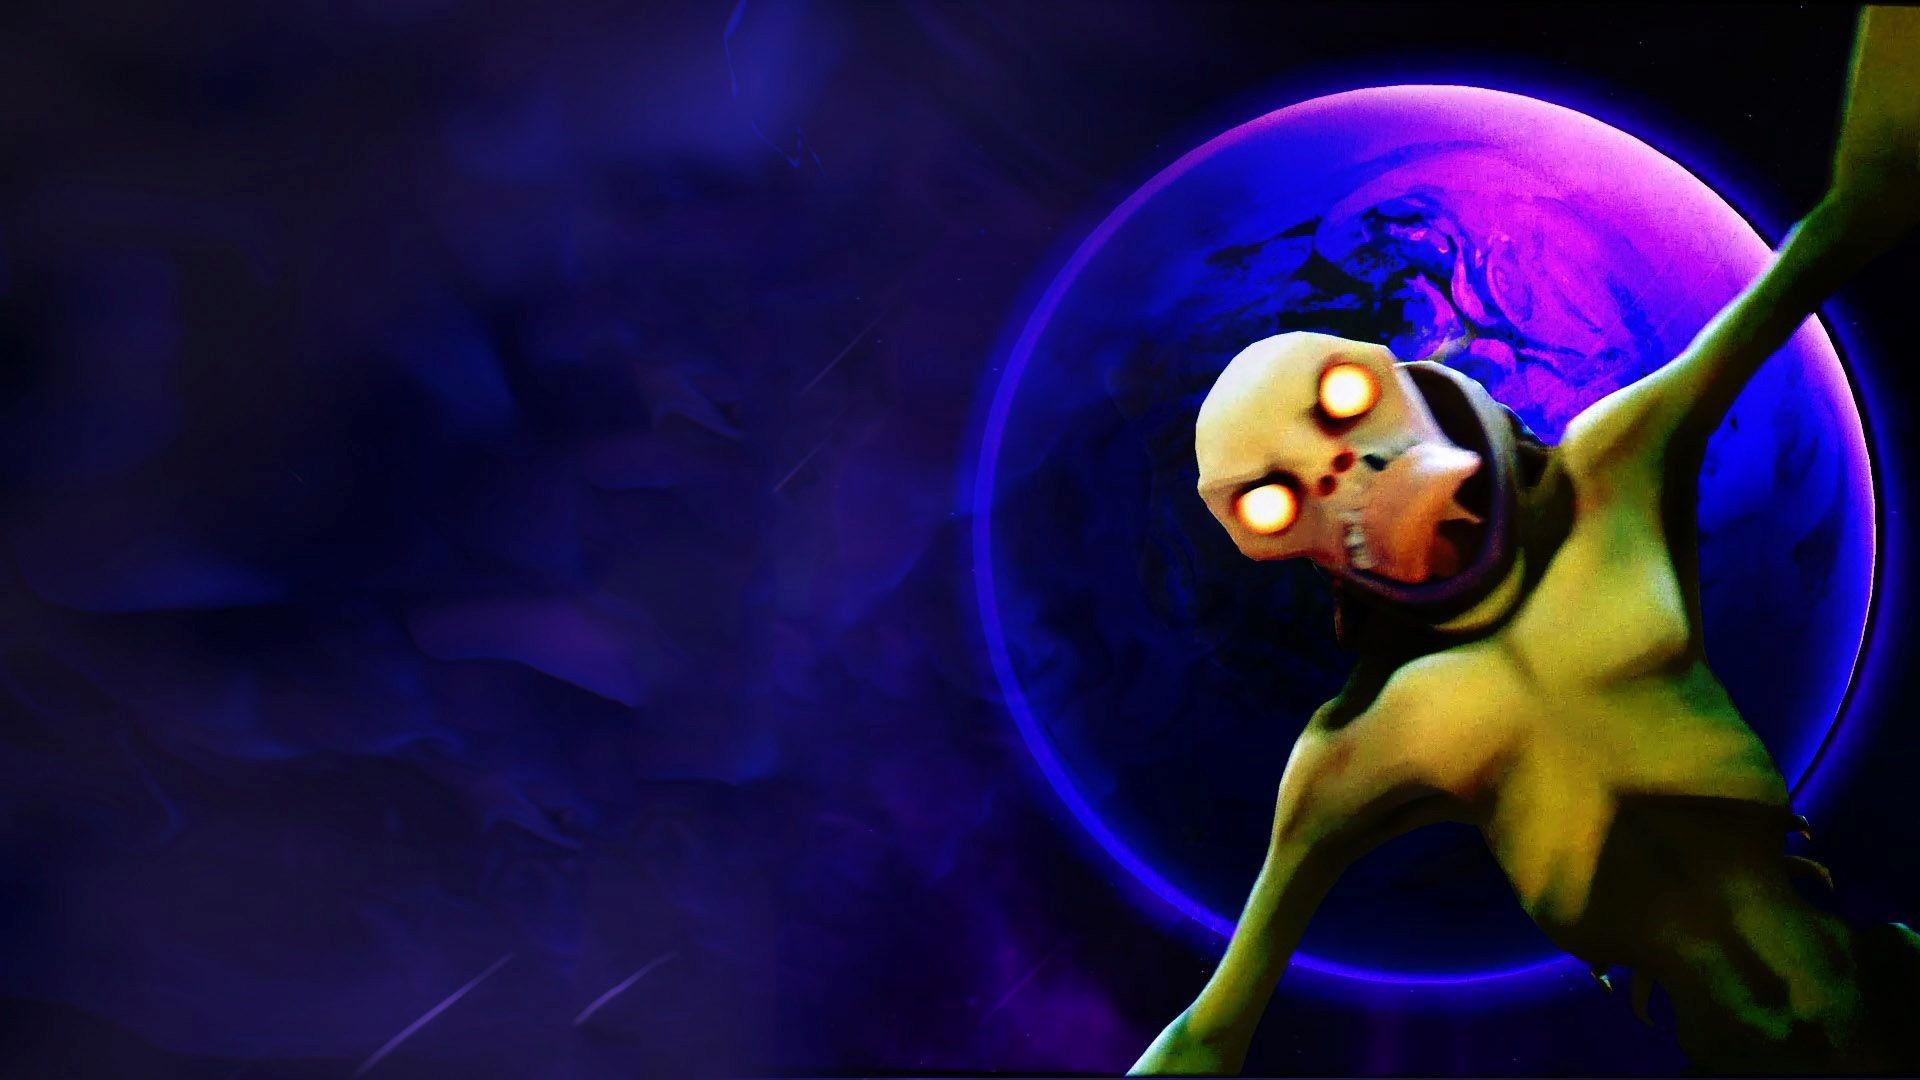 Fortnite Scary Zombie Full Hd 4k Wallpaper - Imagenes De Fortnite En Full 4k Hd , HD Wallpaper & Backgrounds